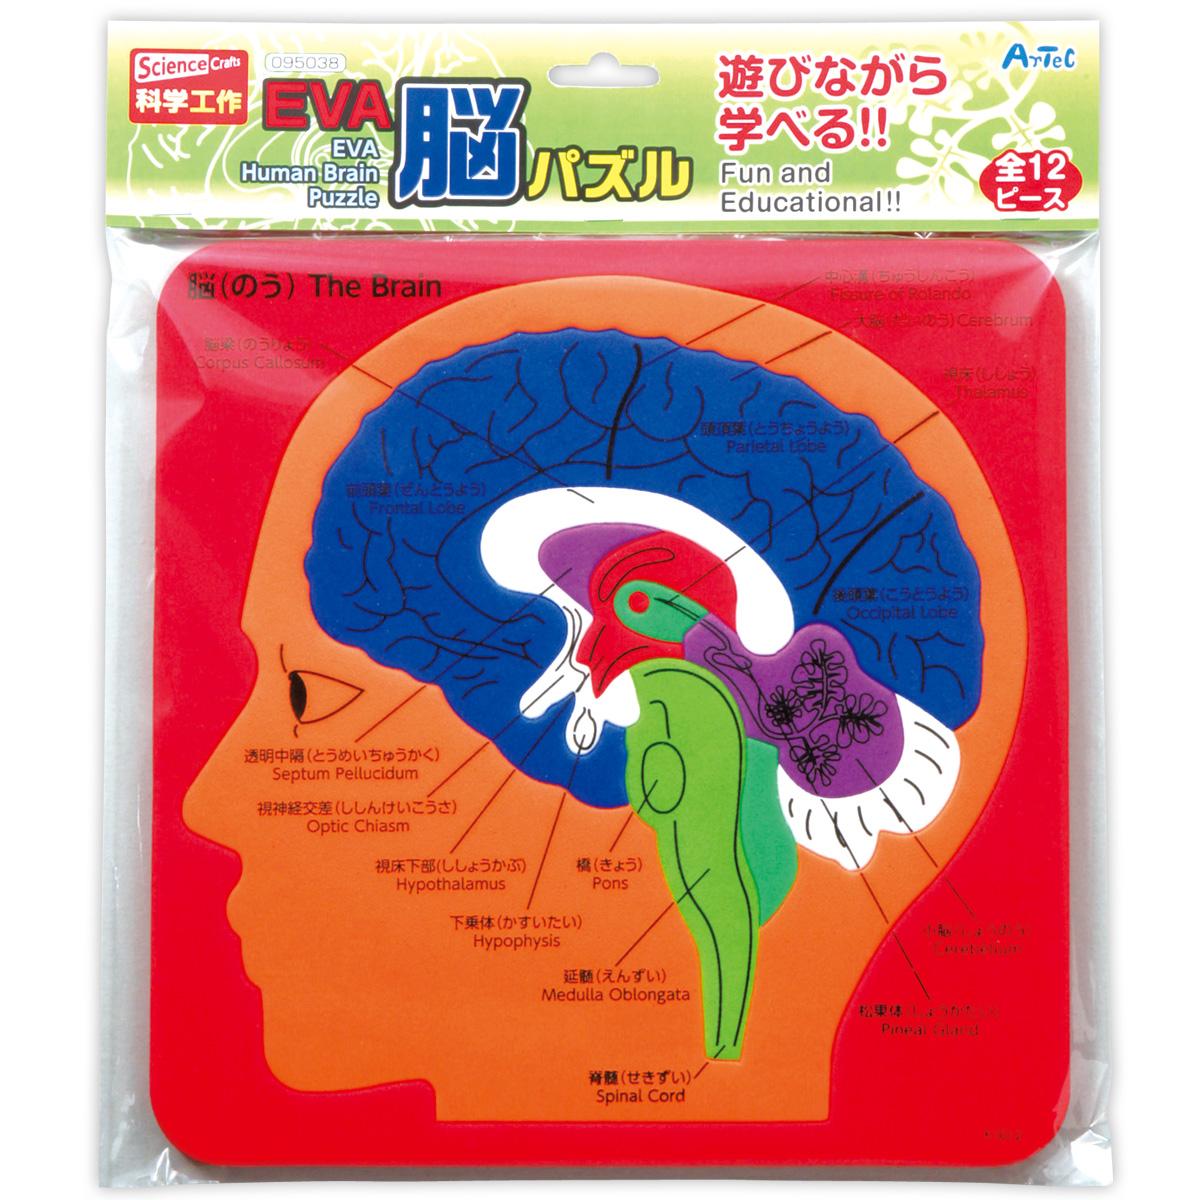 EVA脳パズル パズル ゲーム 玩具 おもちゃ 脳 人の体のしくみ 学習 理科 知育玩具 クリスマスプレゼント